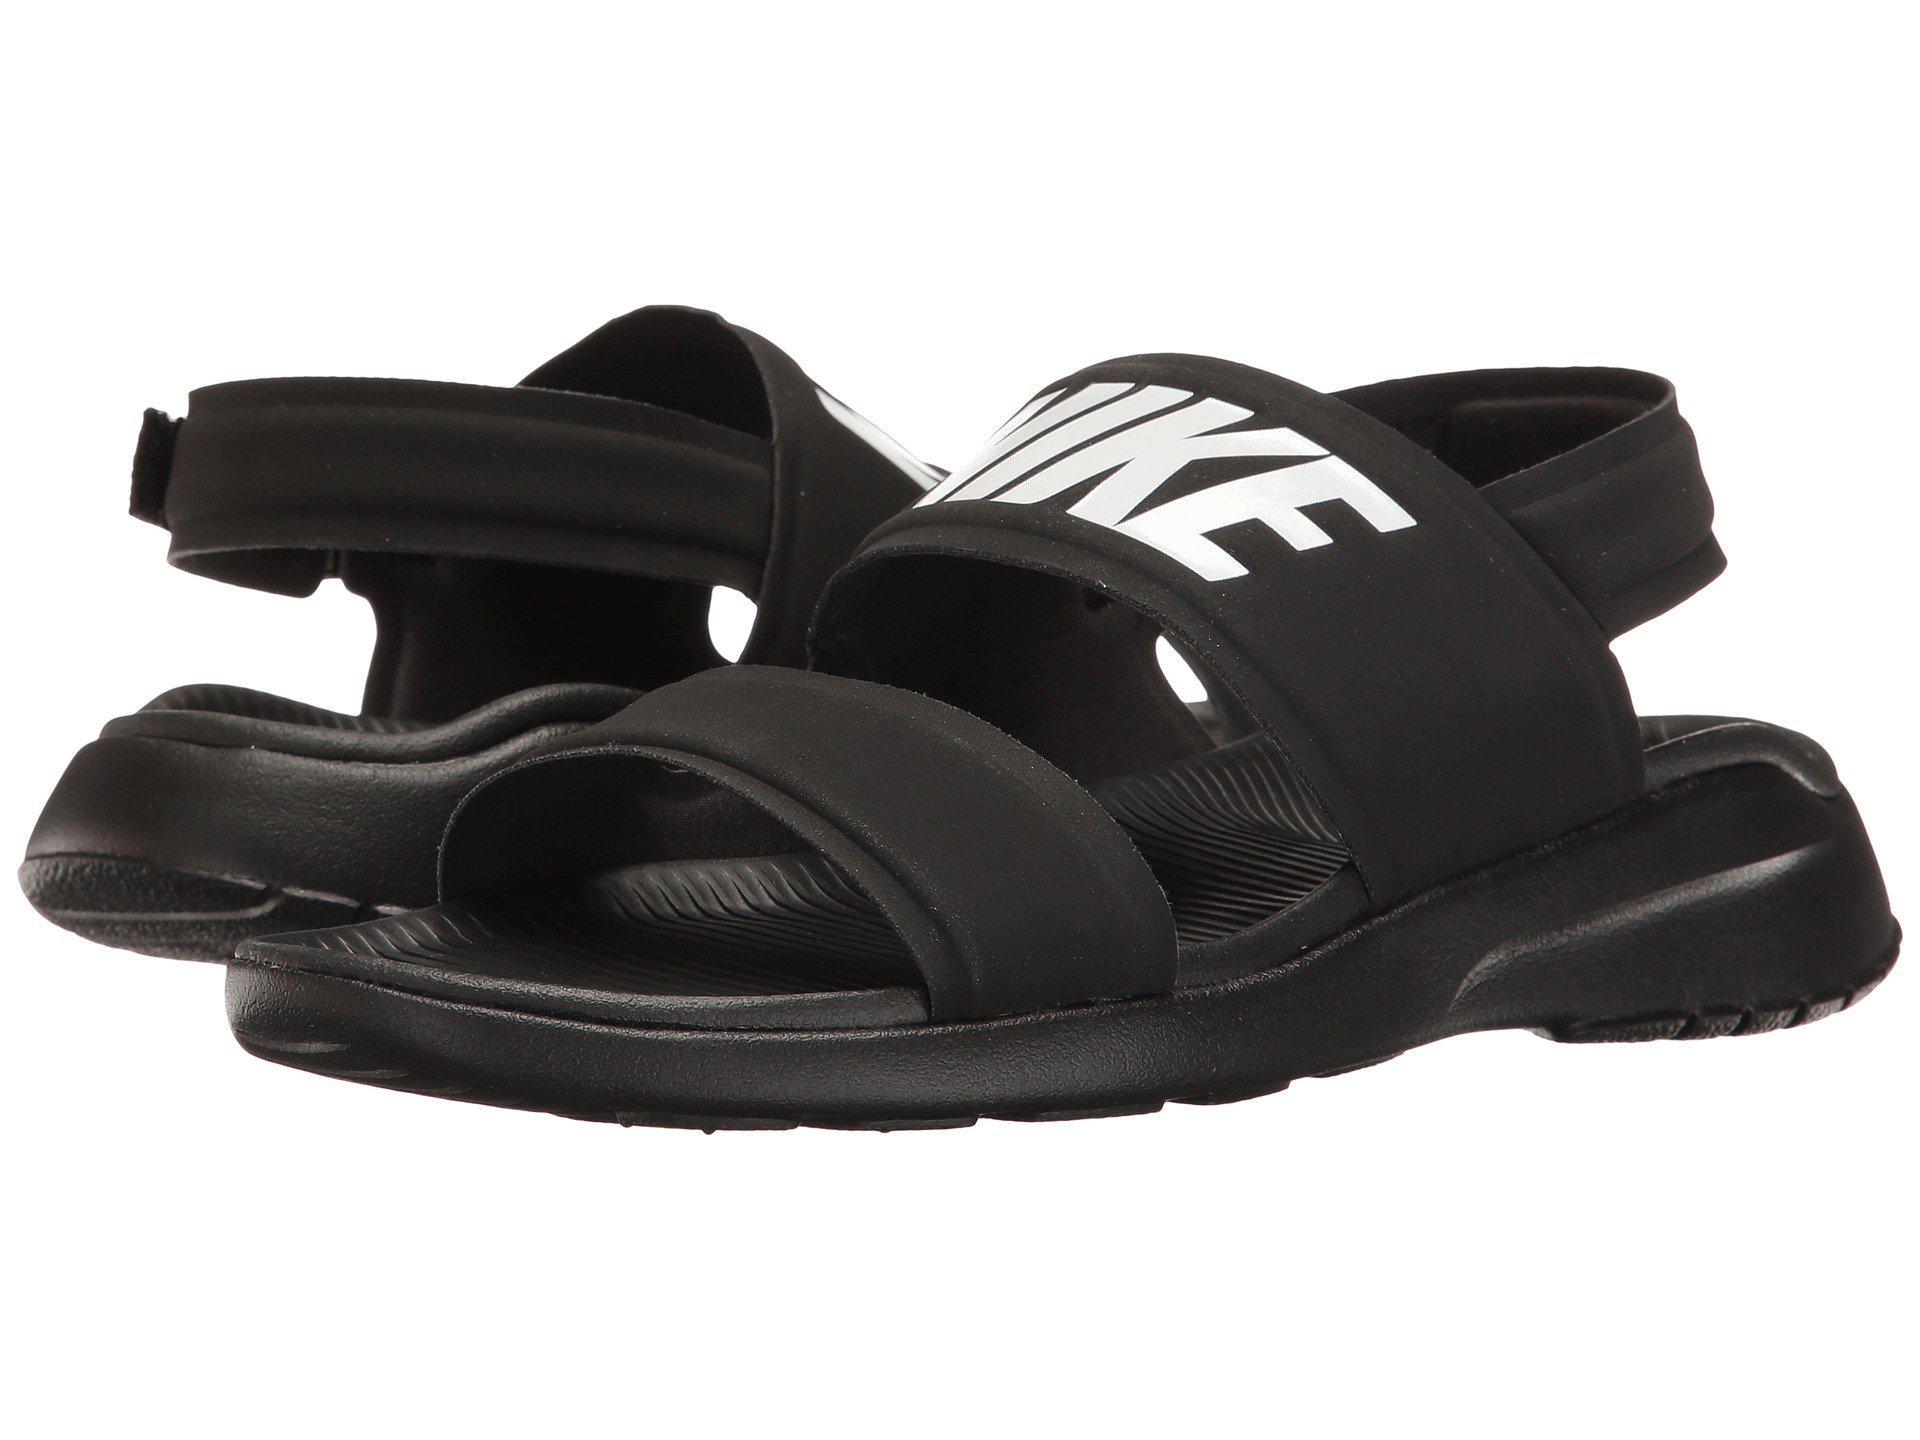 83d77d088420 ... usa lyst nike tanjun sandal cool grey white pure platinum womens 3a163  a17bd